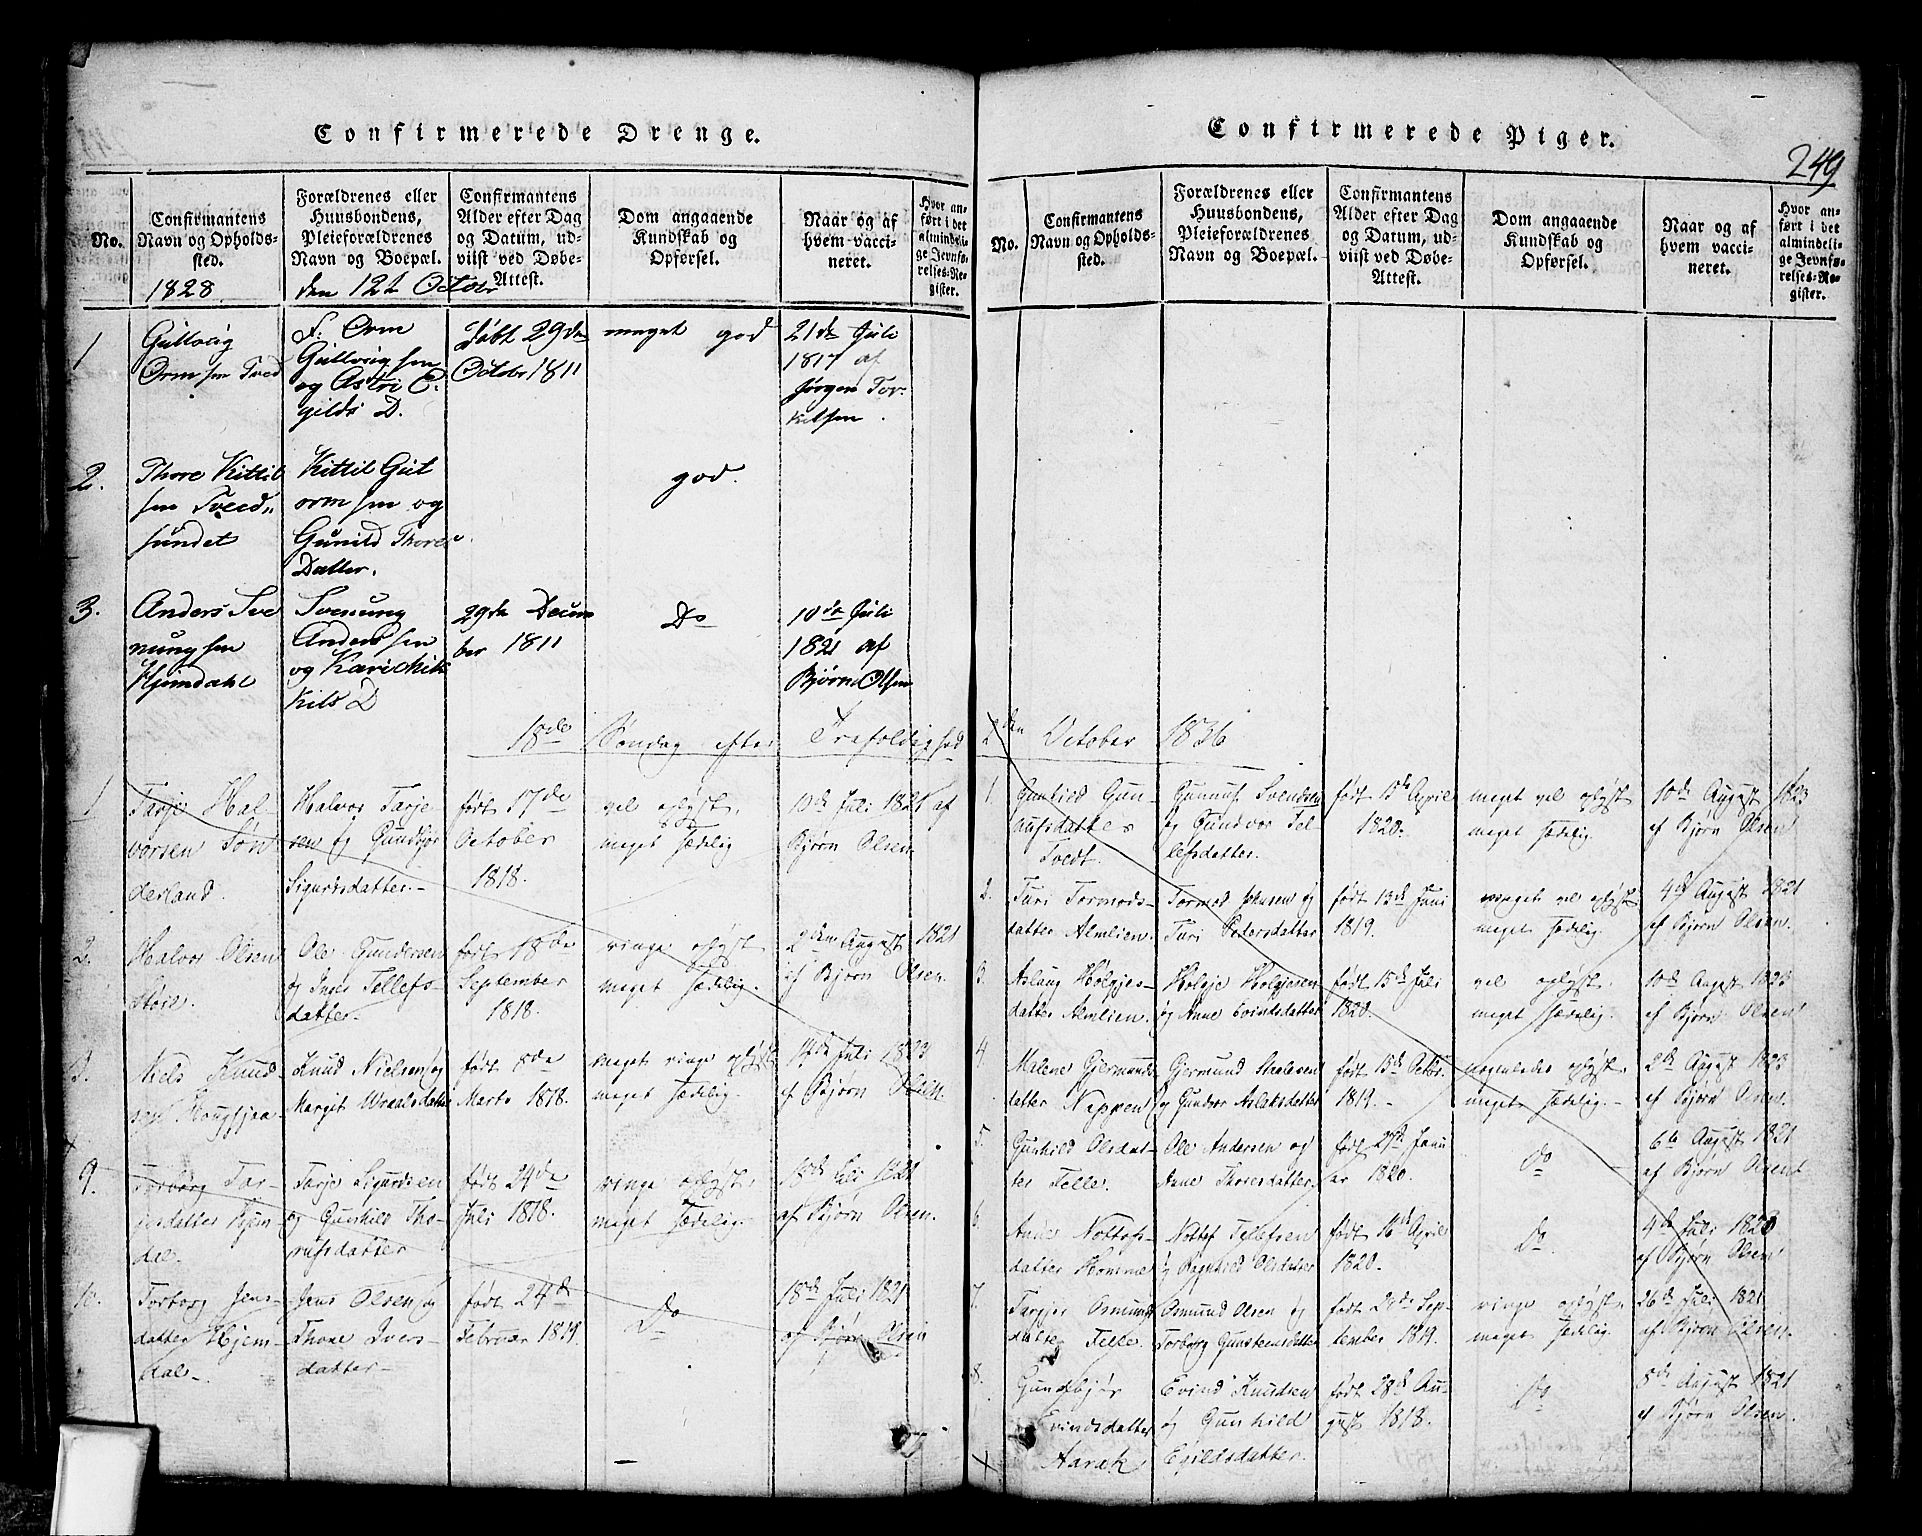 SAKO, Nissedal kirkebøker, G/Gb/L0001: Klokkerbok nr. II 1, 1814-1862, s. 249